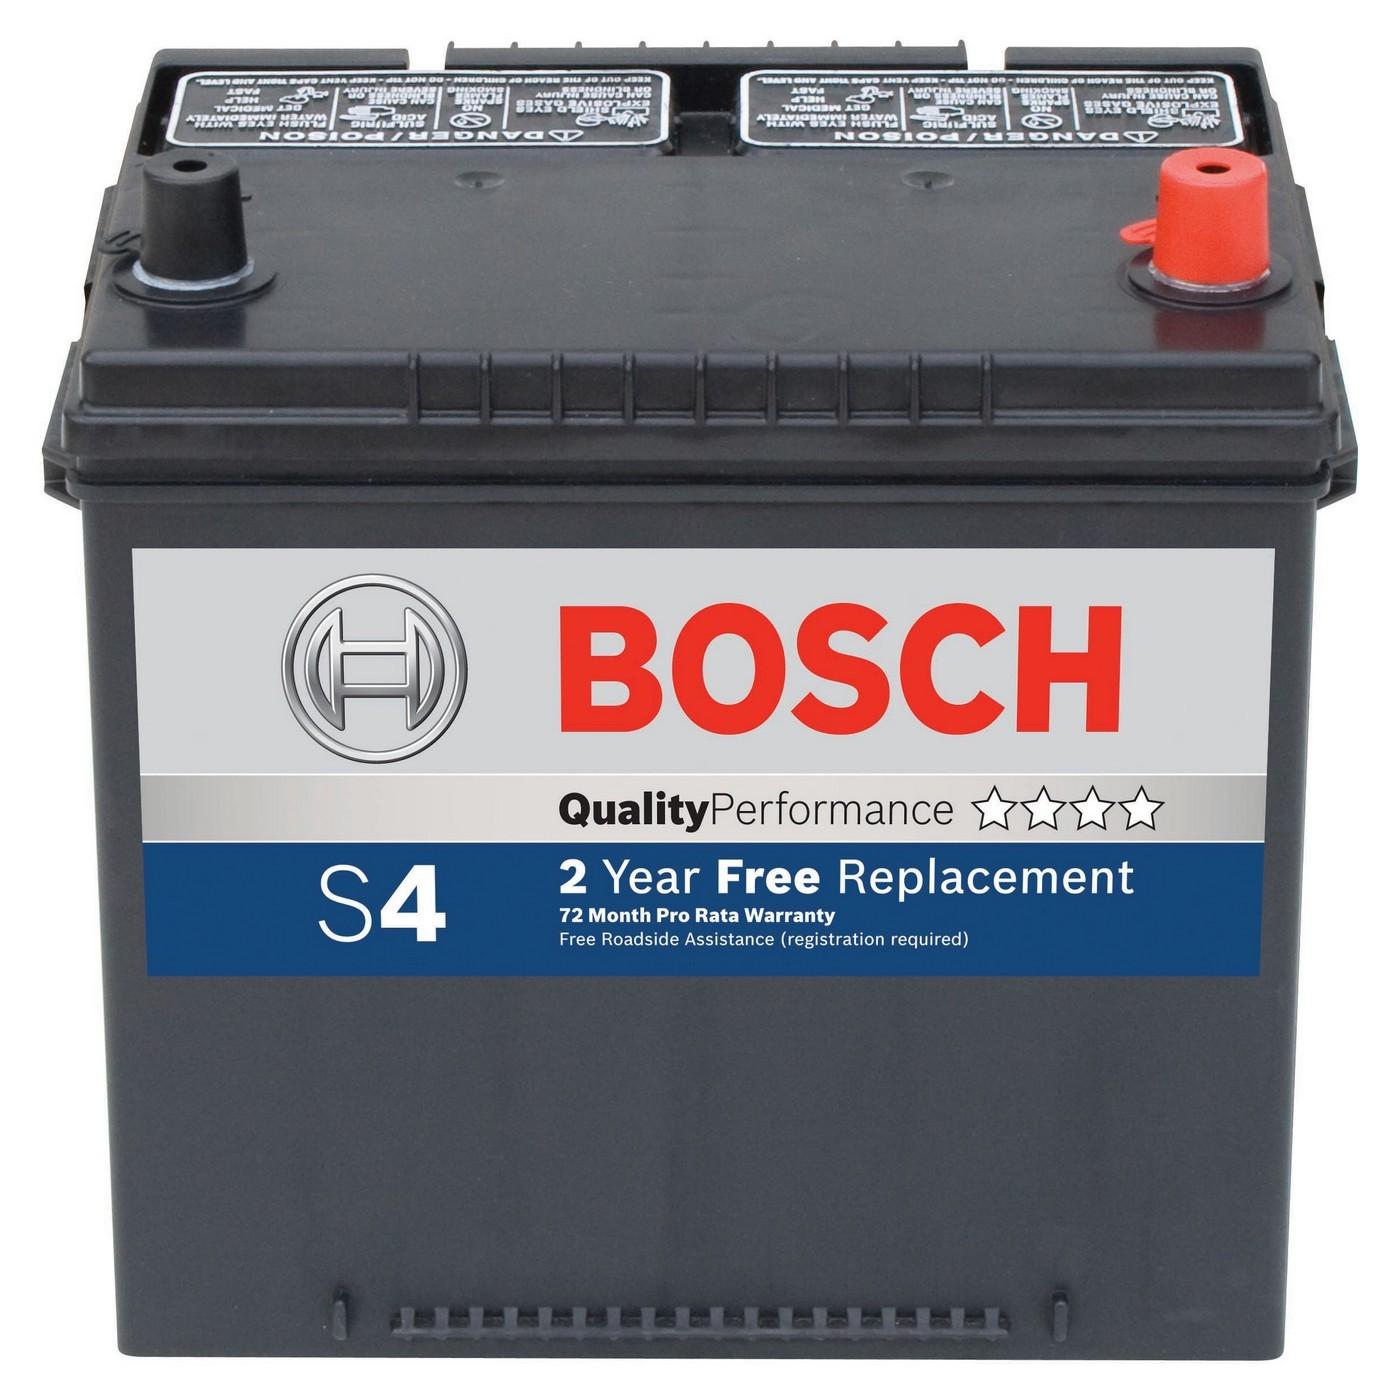 S4 Battery Bosch Auto Parts